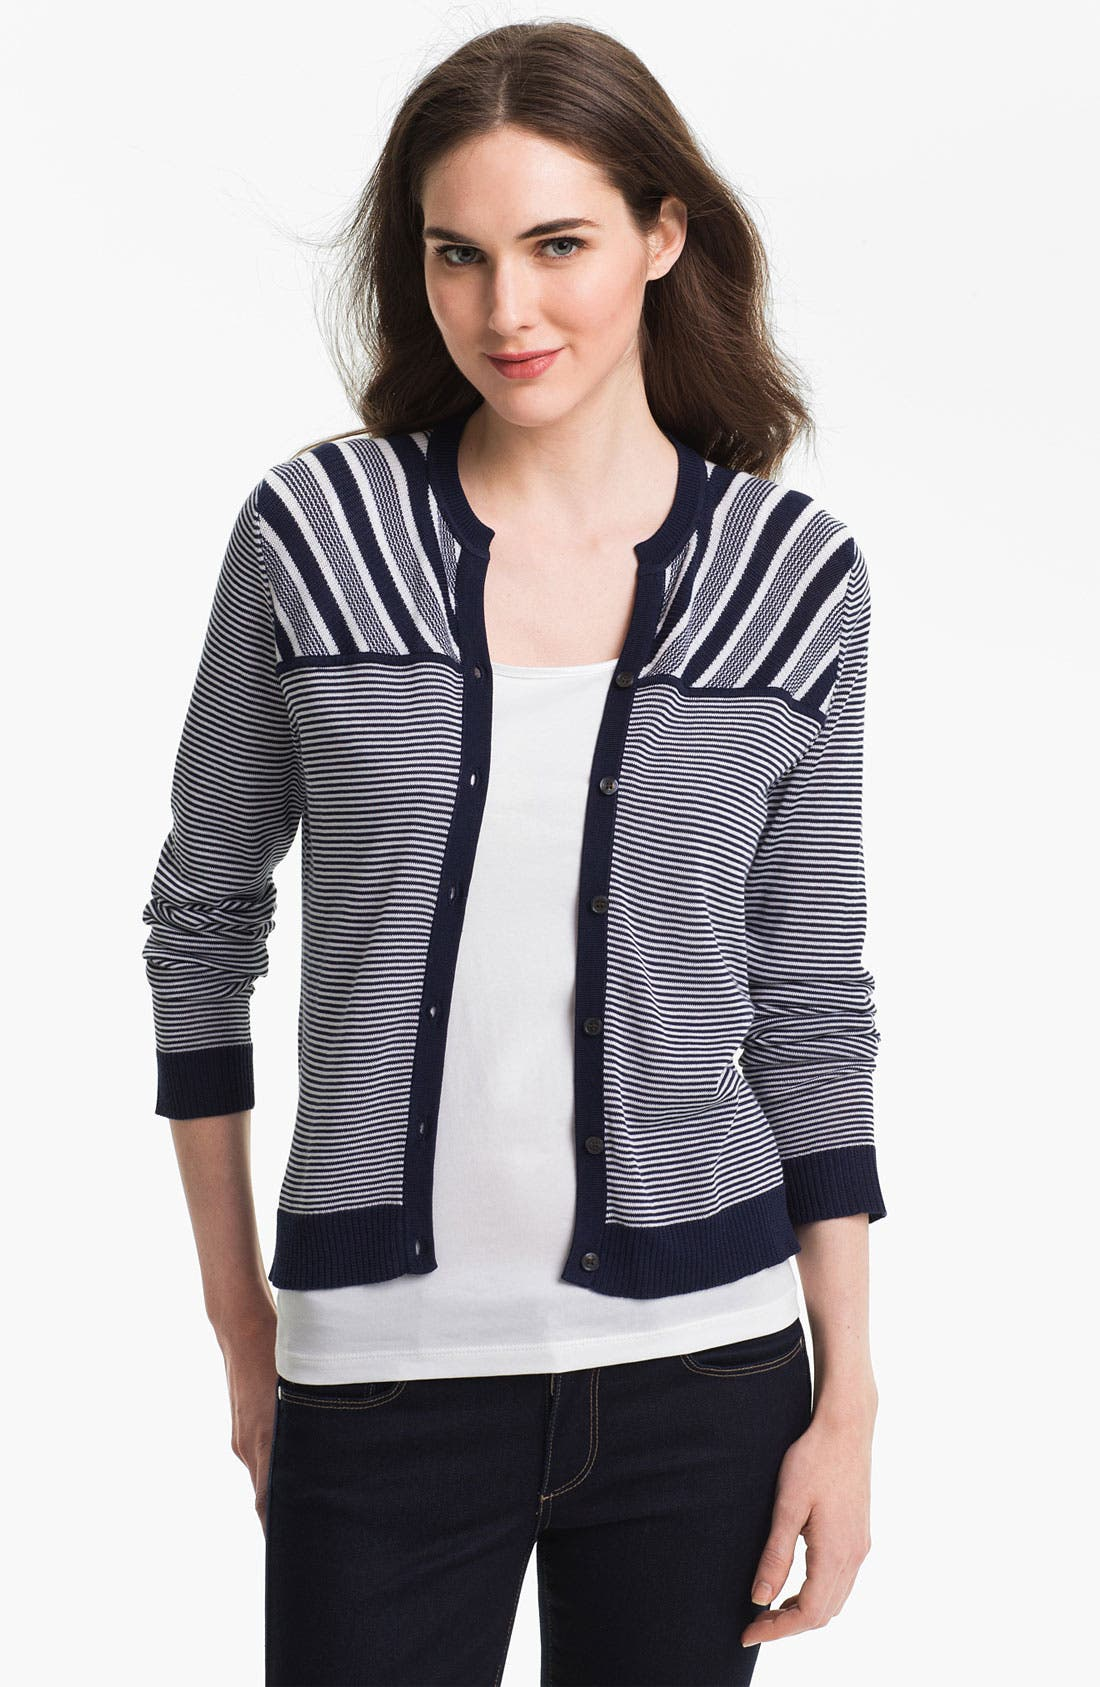 Alternate Image 1 Selected - Anne Klein Three Quarter Sleeve Stripe Cardigan